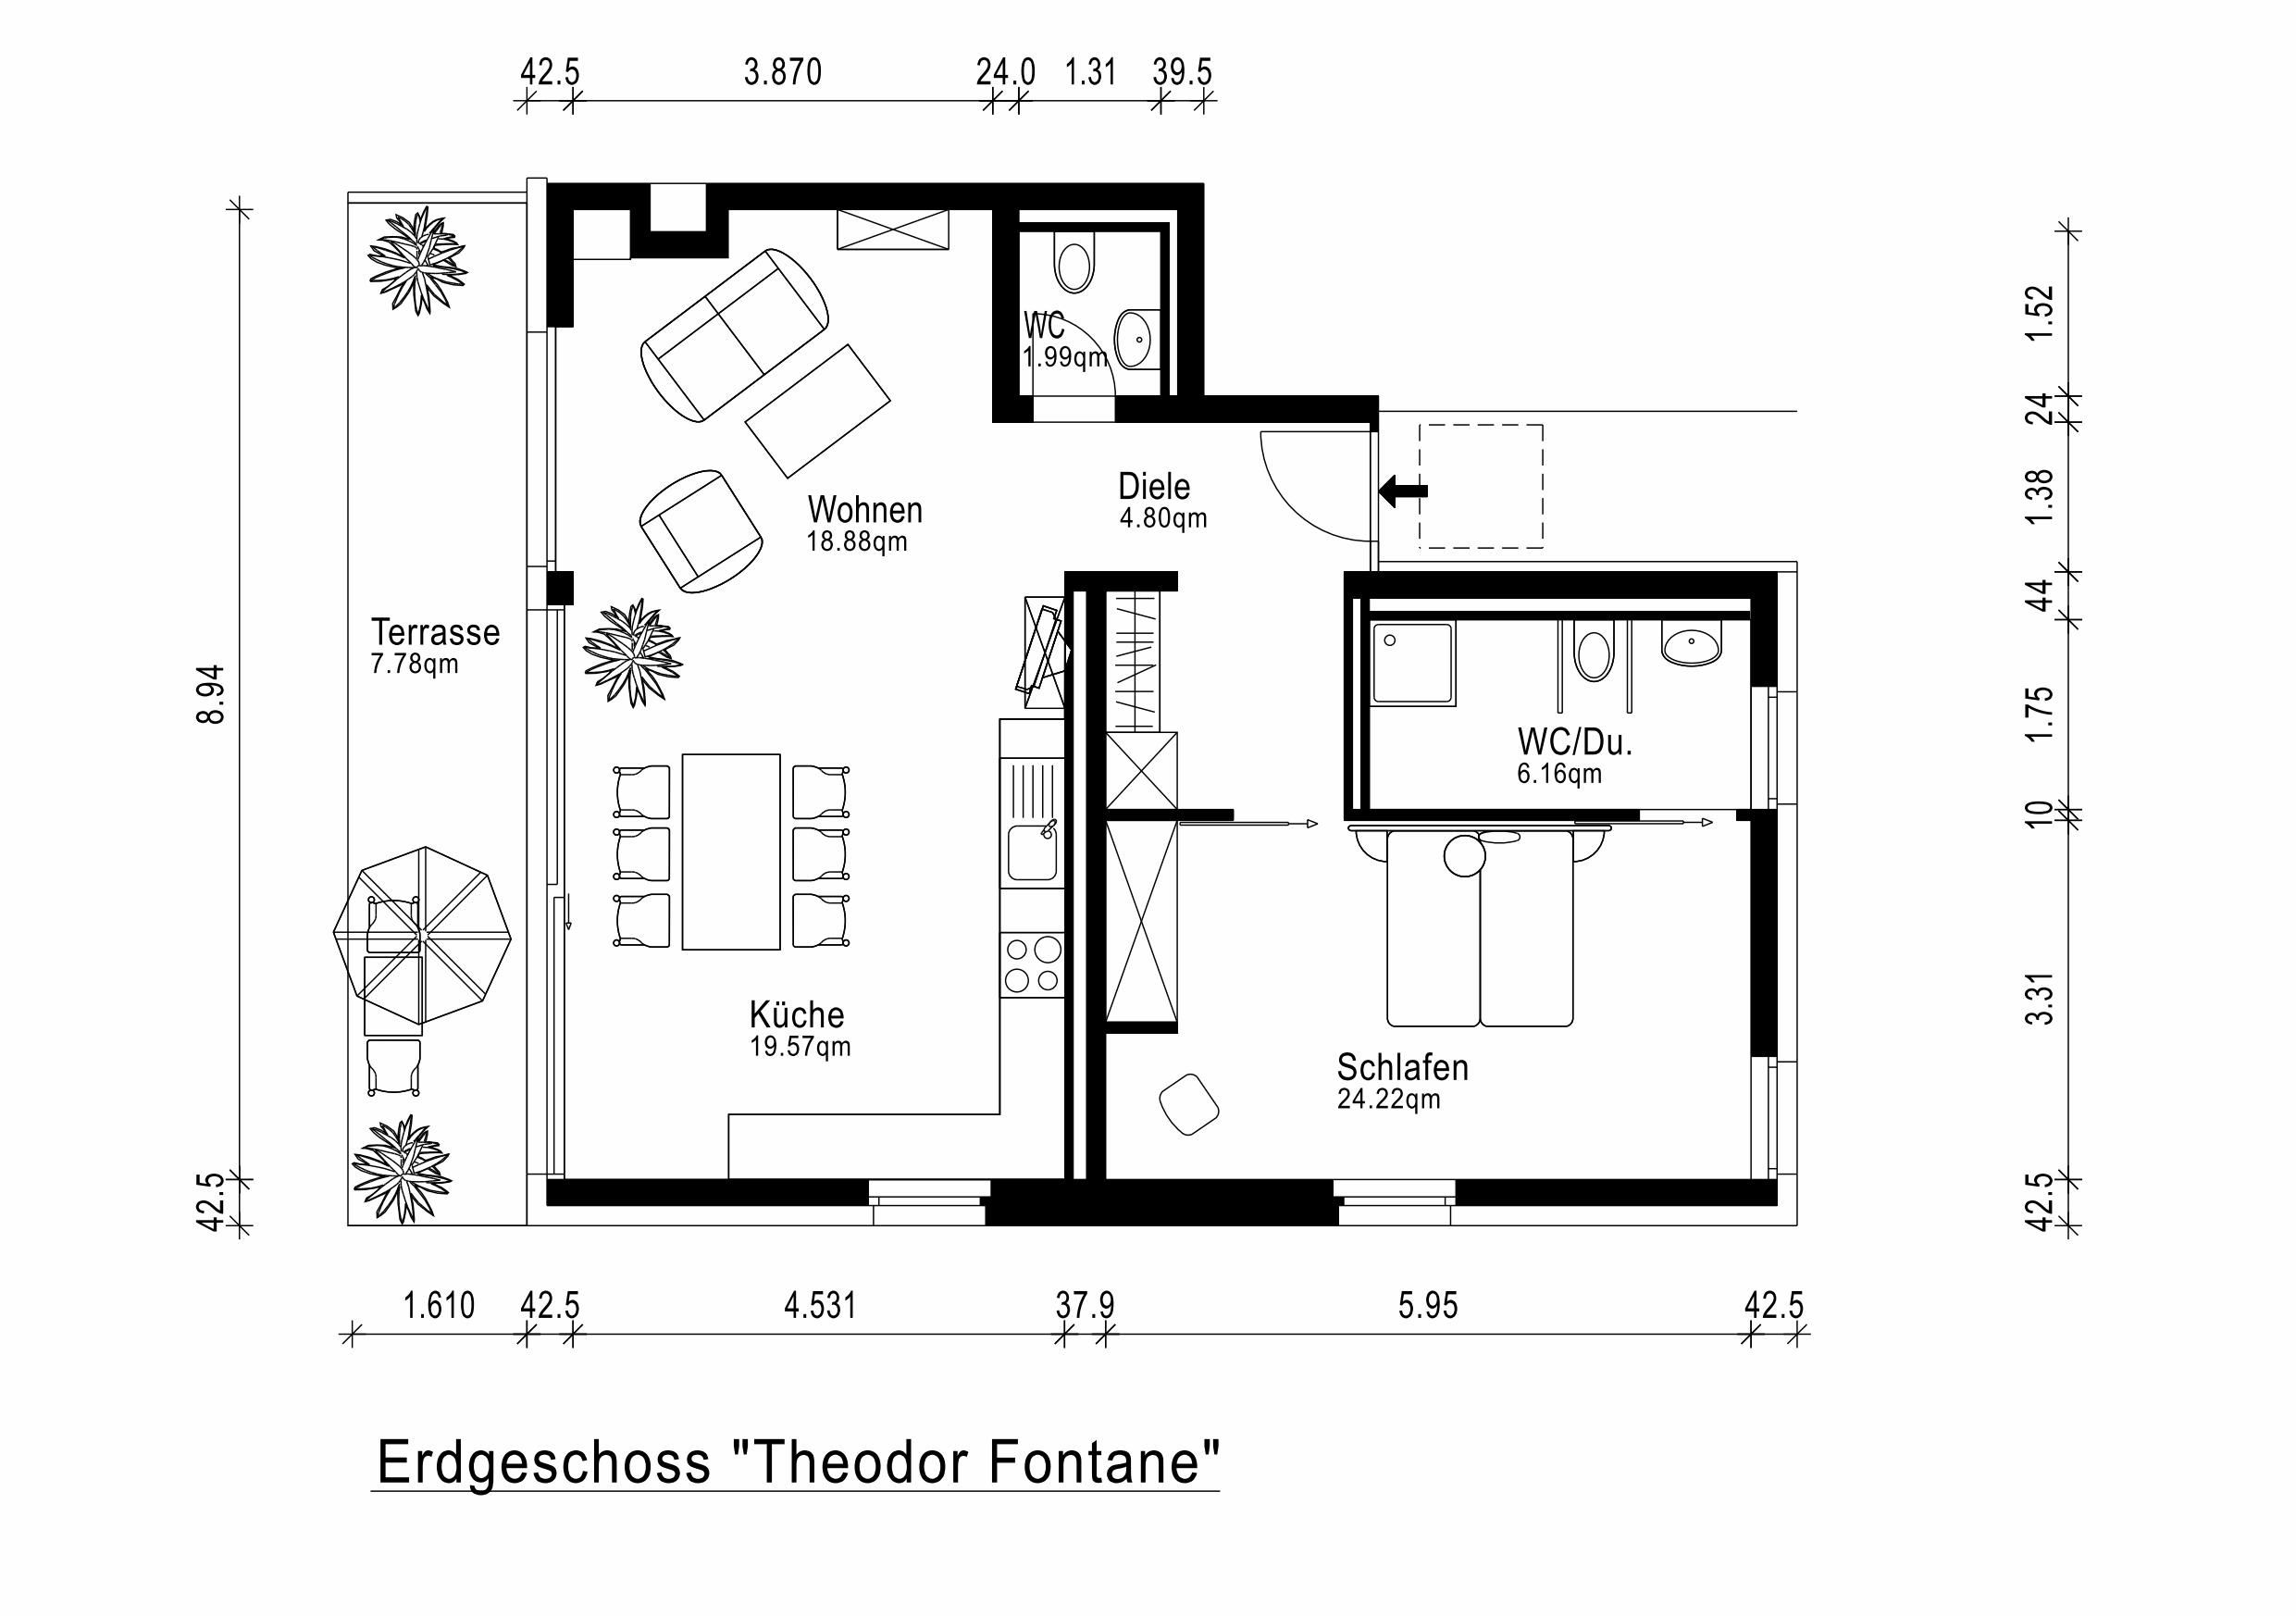 refugium am see theodor fontane. Black Bedroom Furniture Sets. Home Design Ideas